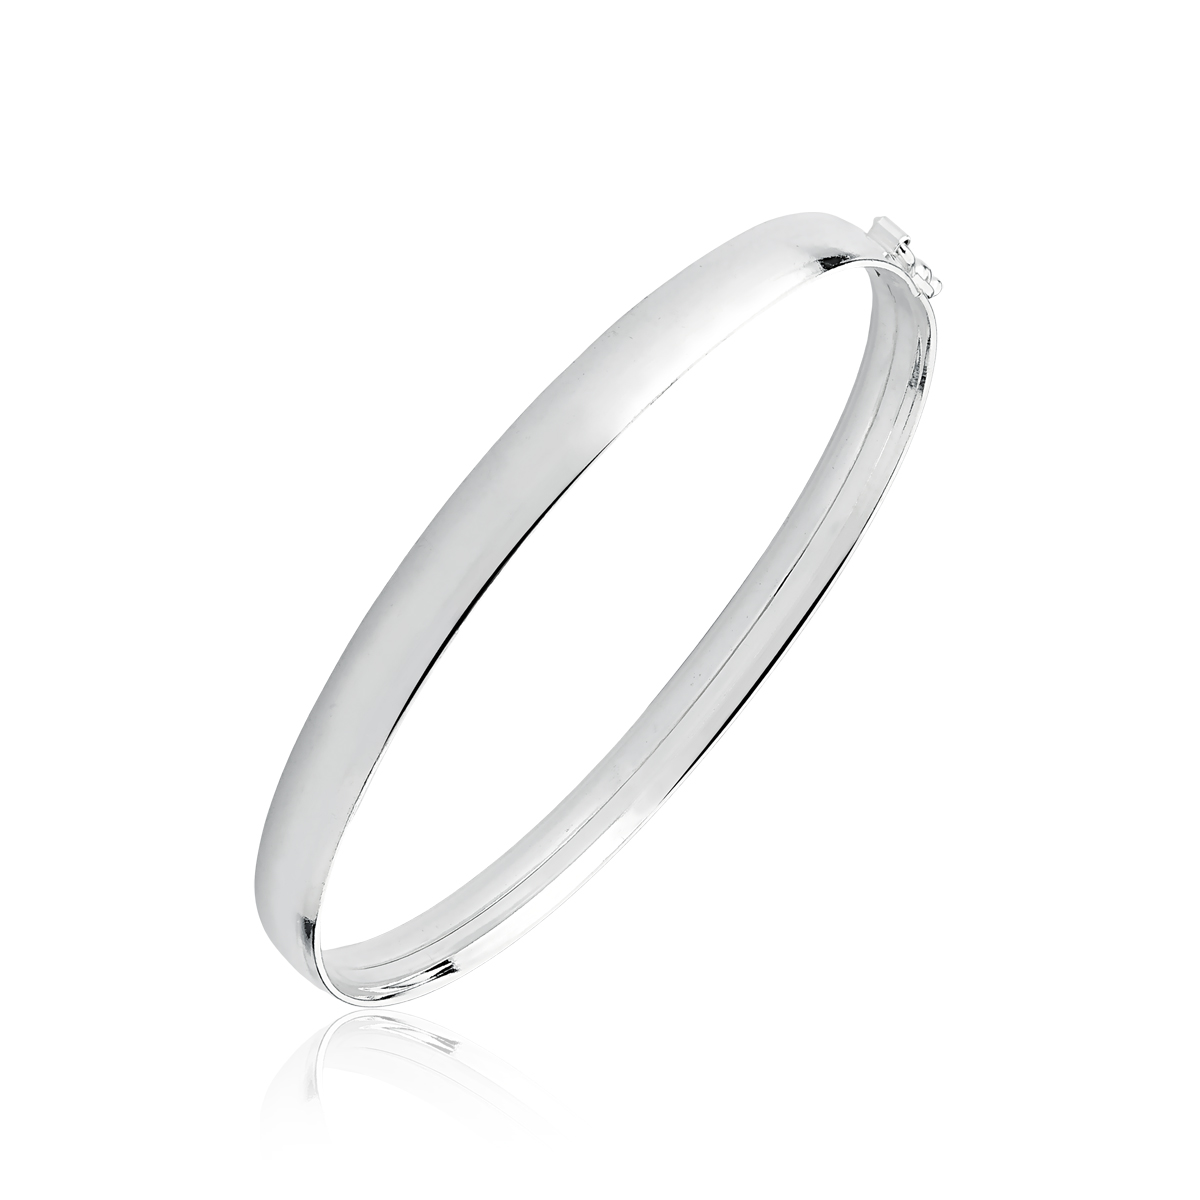 Bracelete Meia Cana Grosso 20 CM